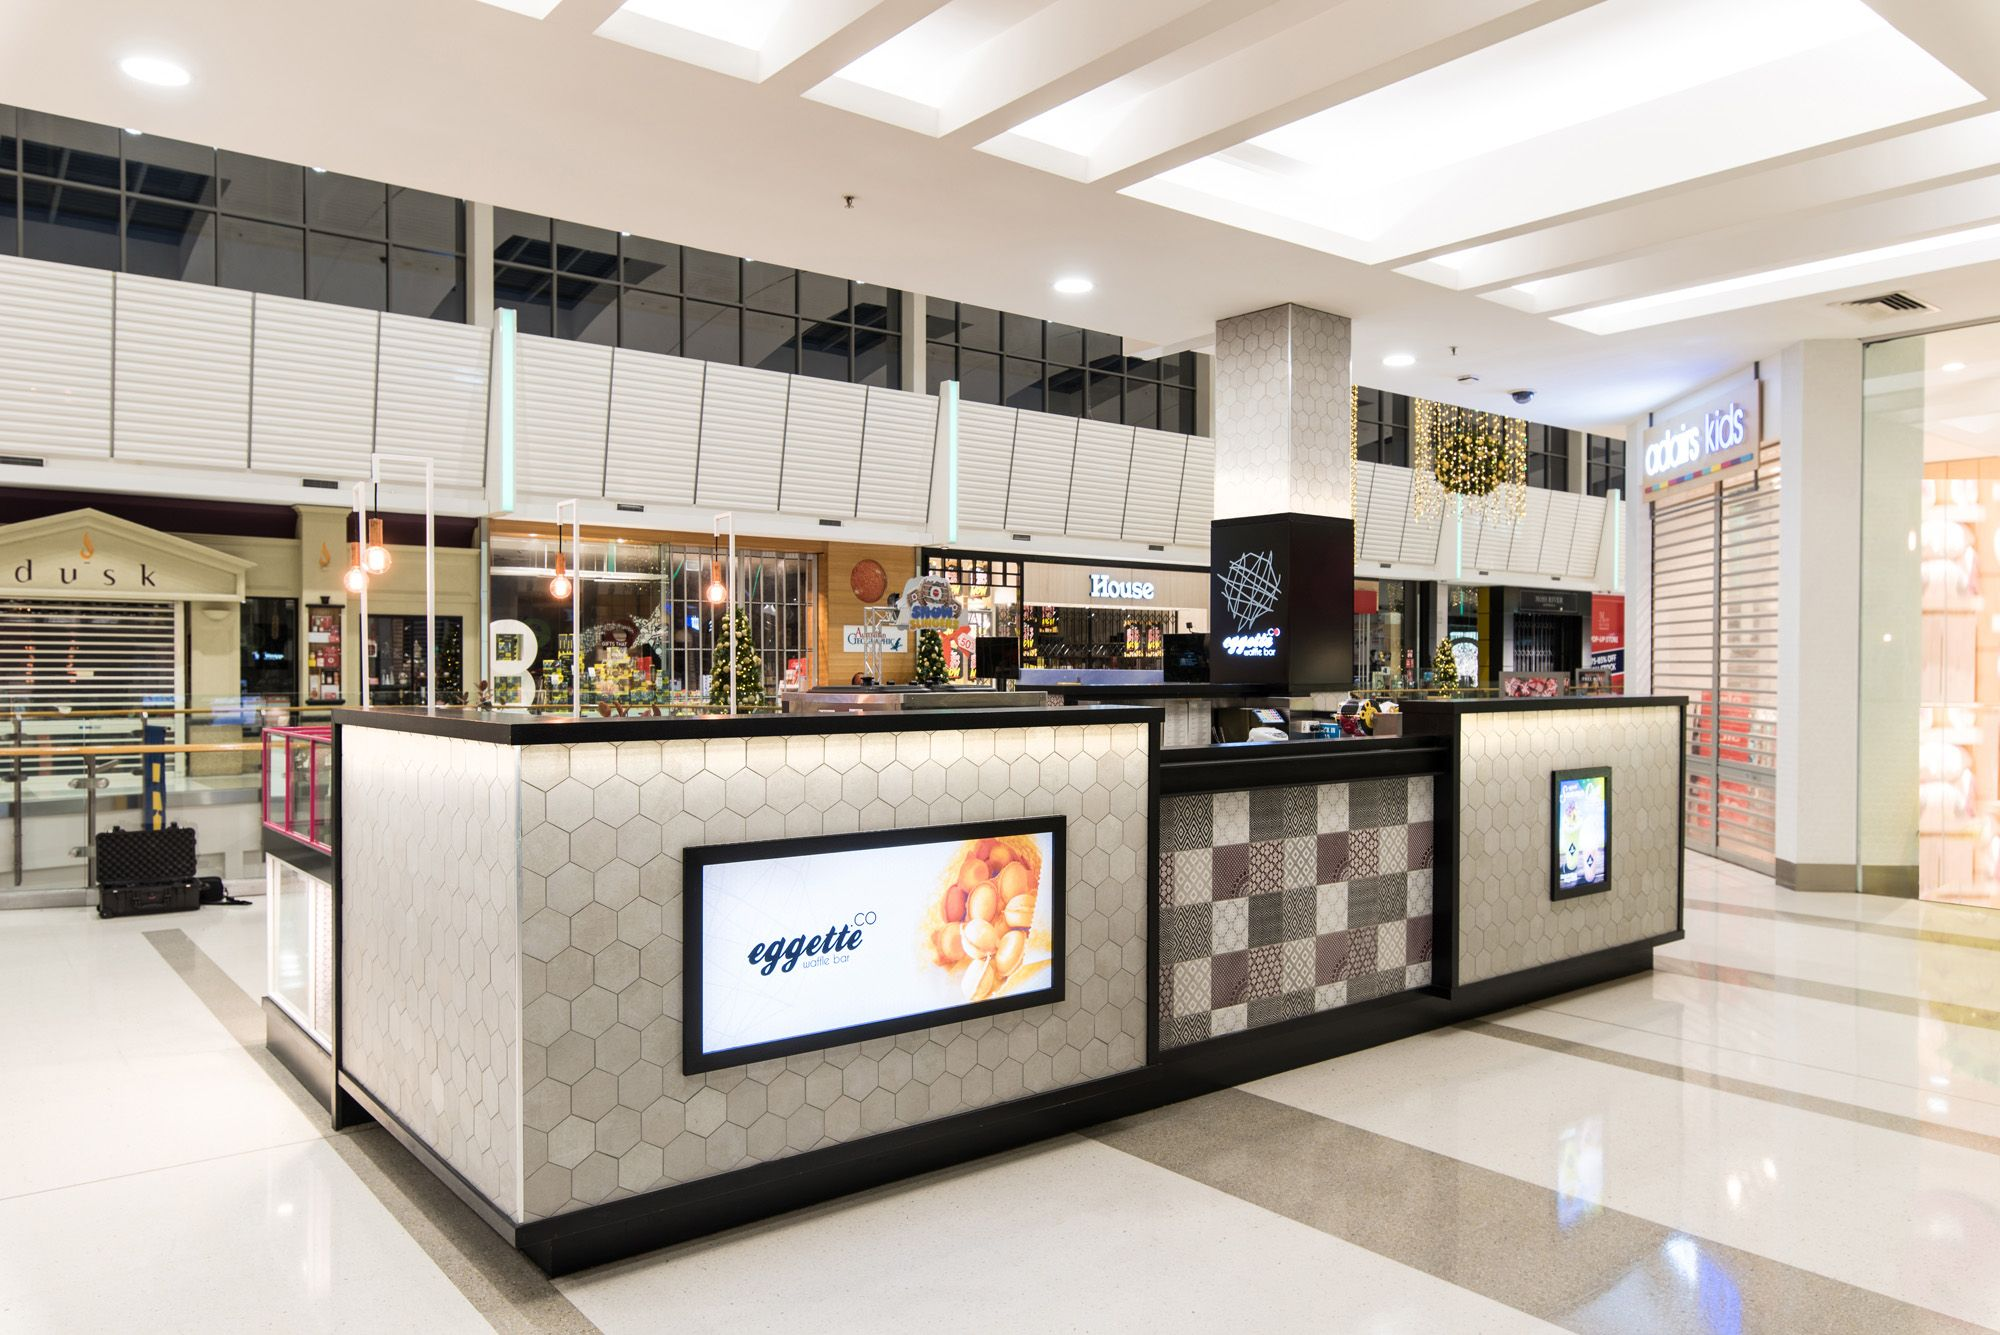 Basalt Studio Interior Design Architecture Sydney Retail Shop Food Eggette Waffle Bar Kiosk Rhodes12